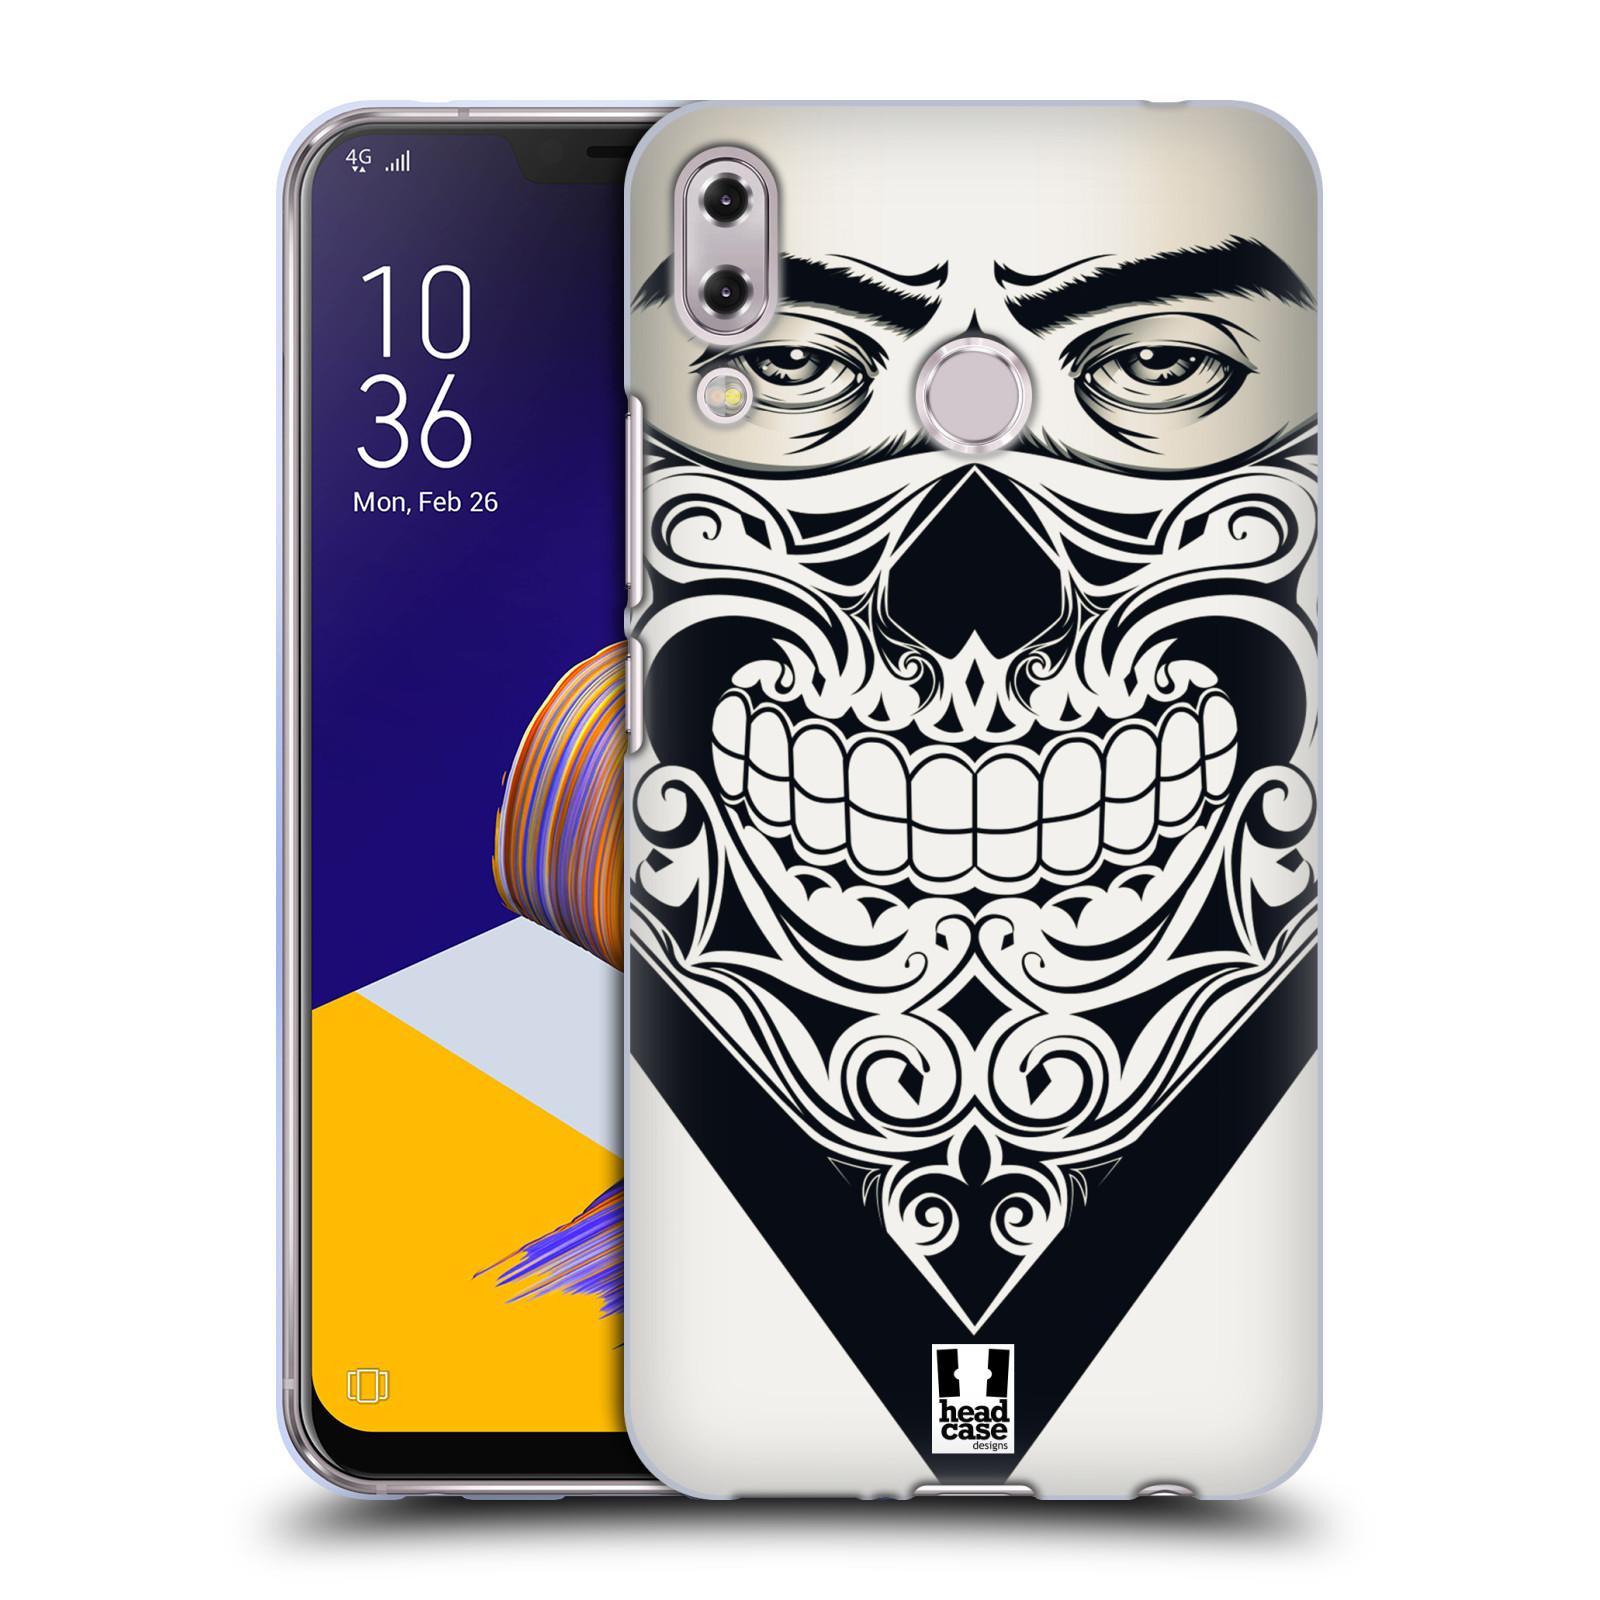 Silikonové pouzdro na mobil Asus ZenFone 5 ZE620KL - Head Case - LEBKA BANDANA